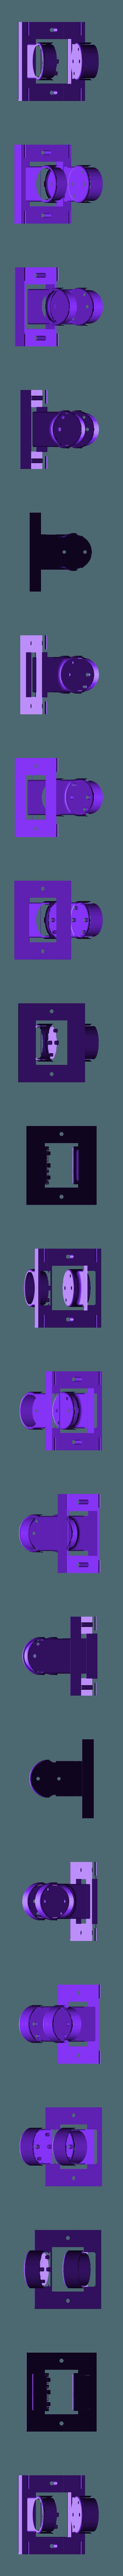 Gu10_LED_Wall_Light___mount.stl Download free STL file Gu10 LED Wall Lamp • 3D printable design, vmi